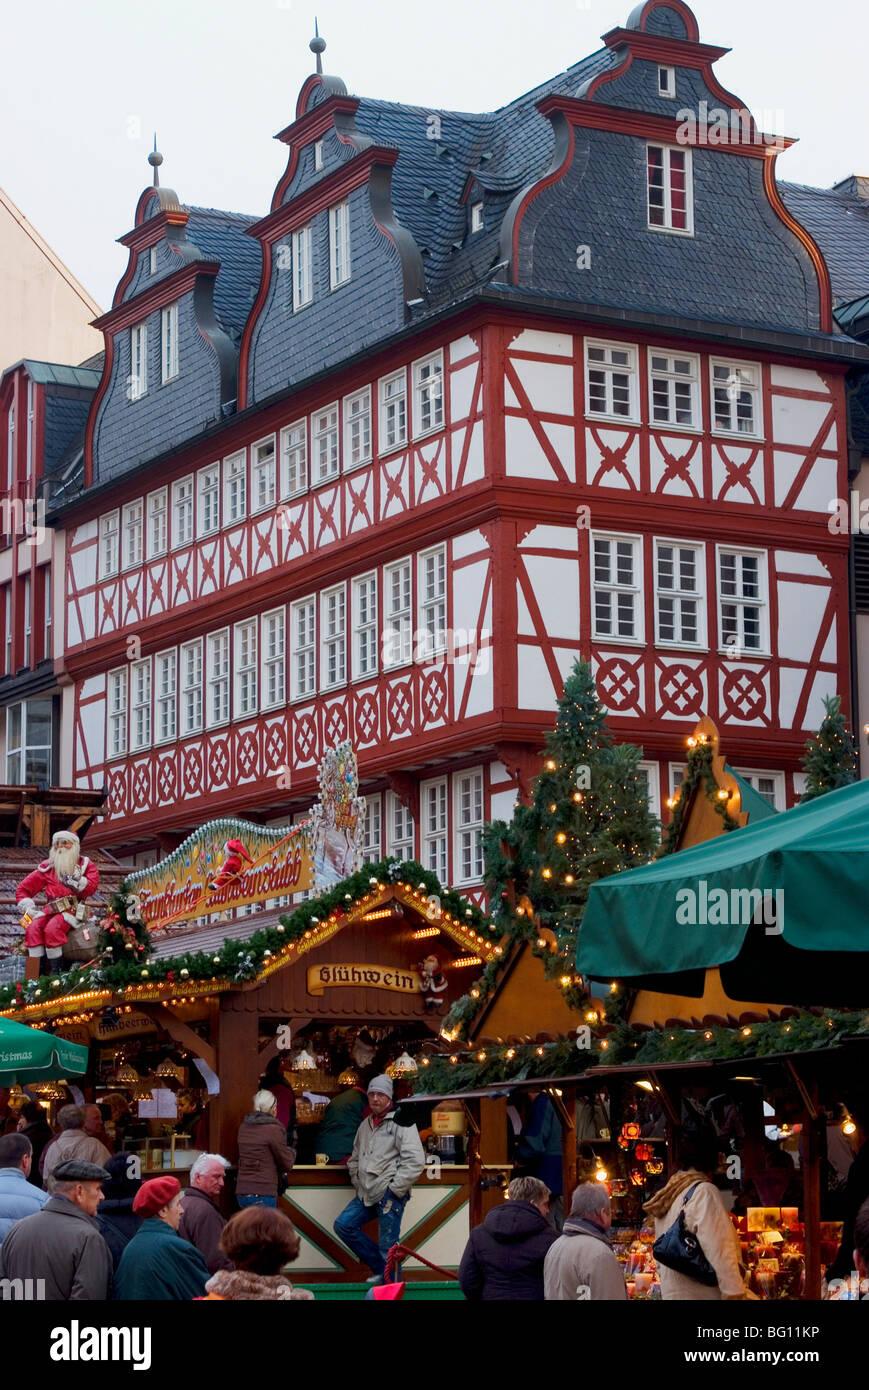 Weihnachtsmarkt (Christmas Market), Frankfurt, Hesse, Germany, Europe Stock Photo